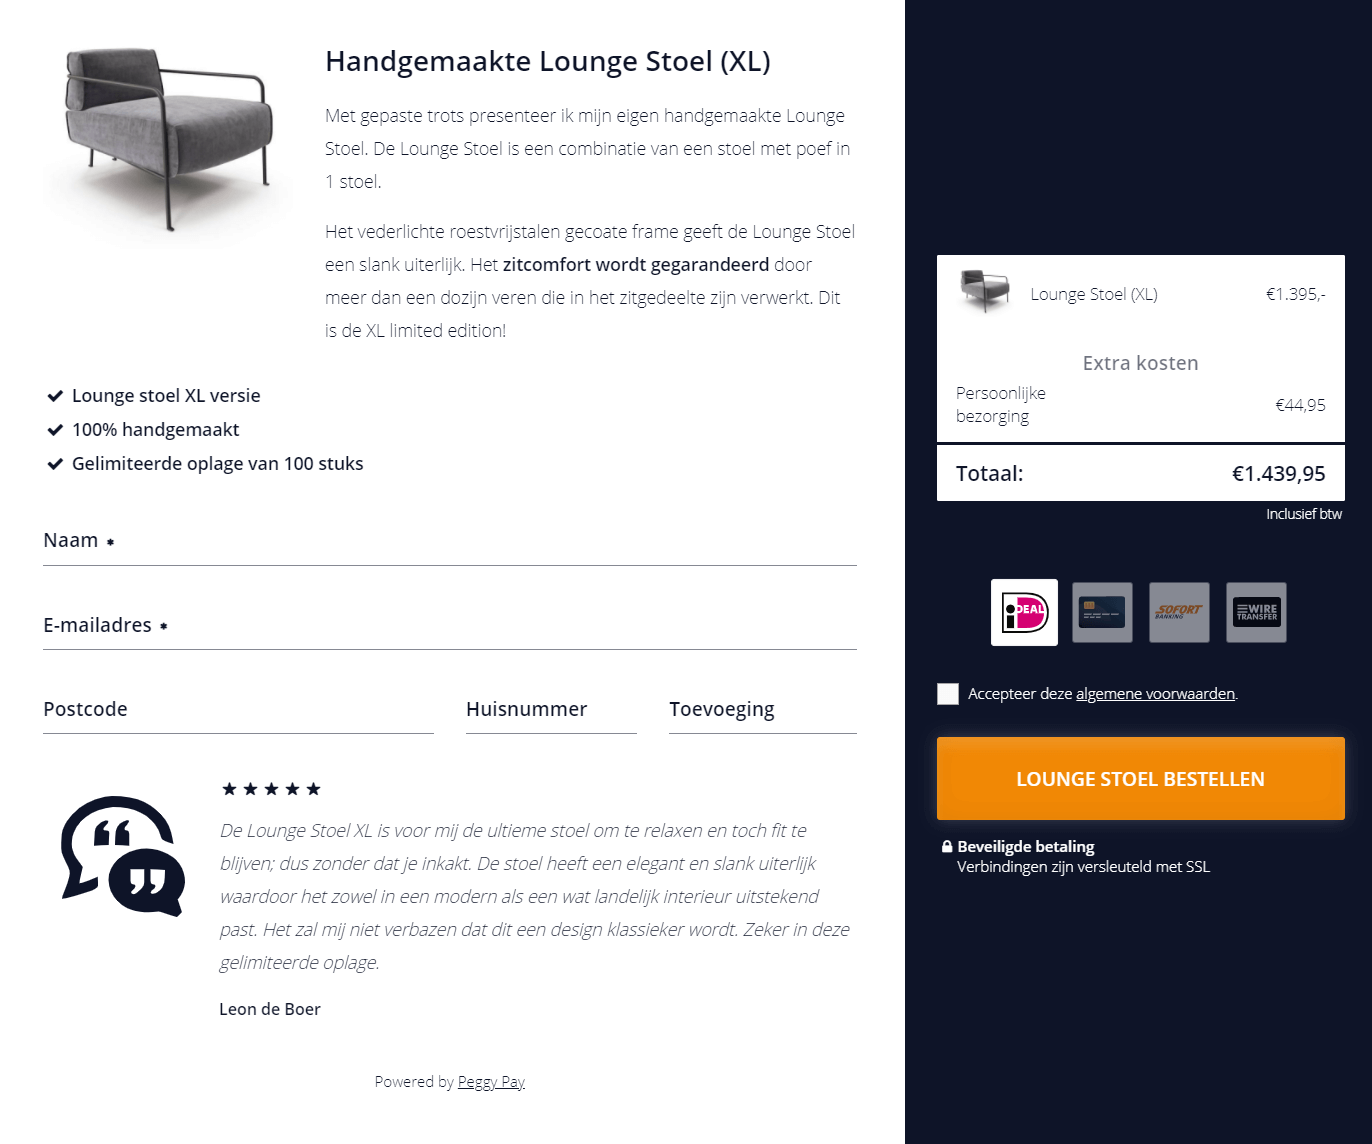 Betaalpagina met ideal - Handgemaakte loungestoel (XL)